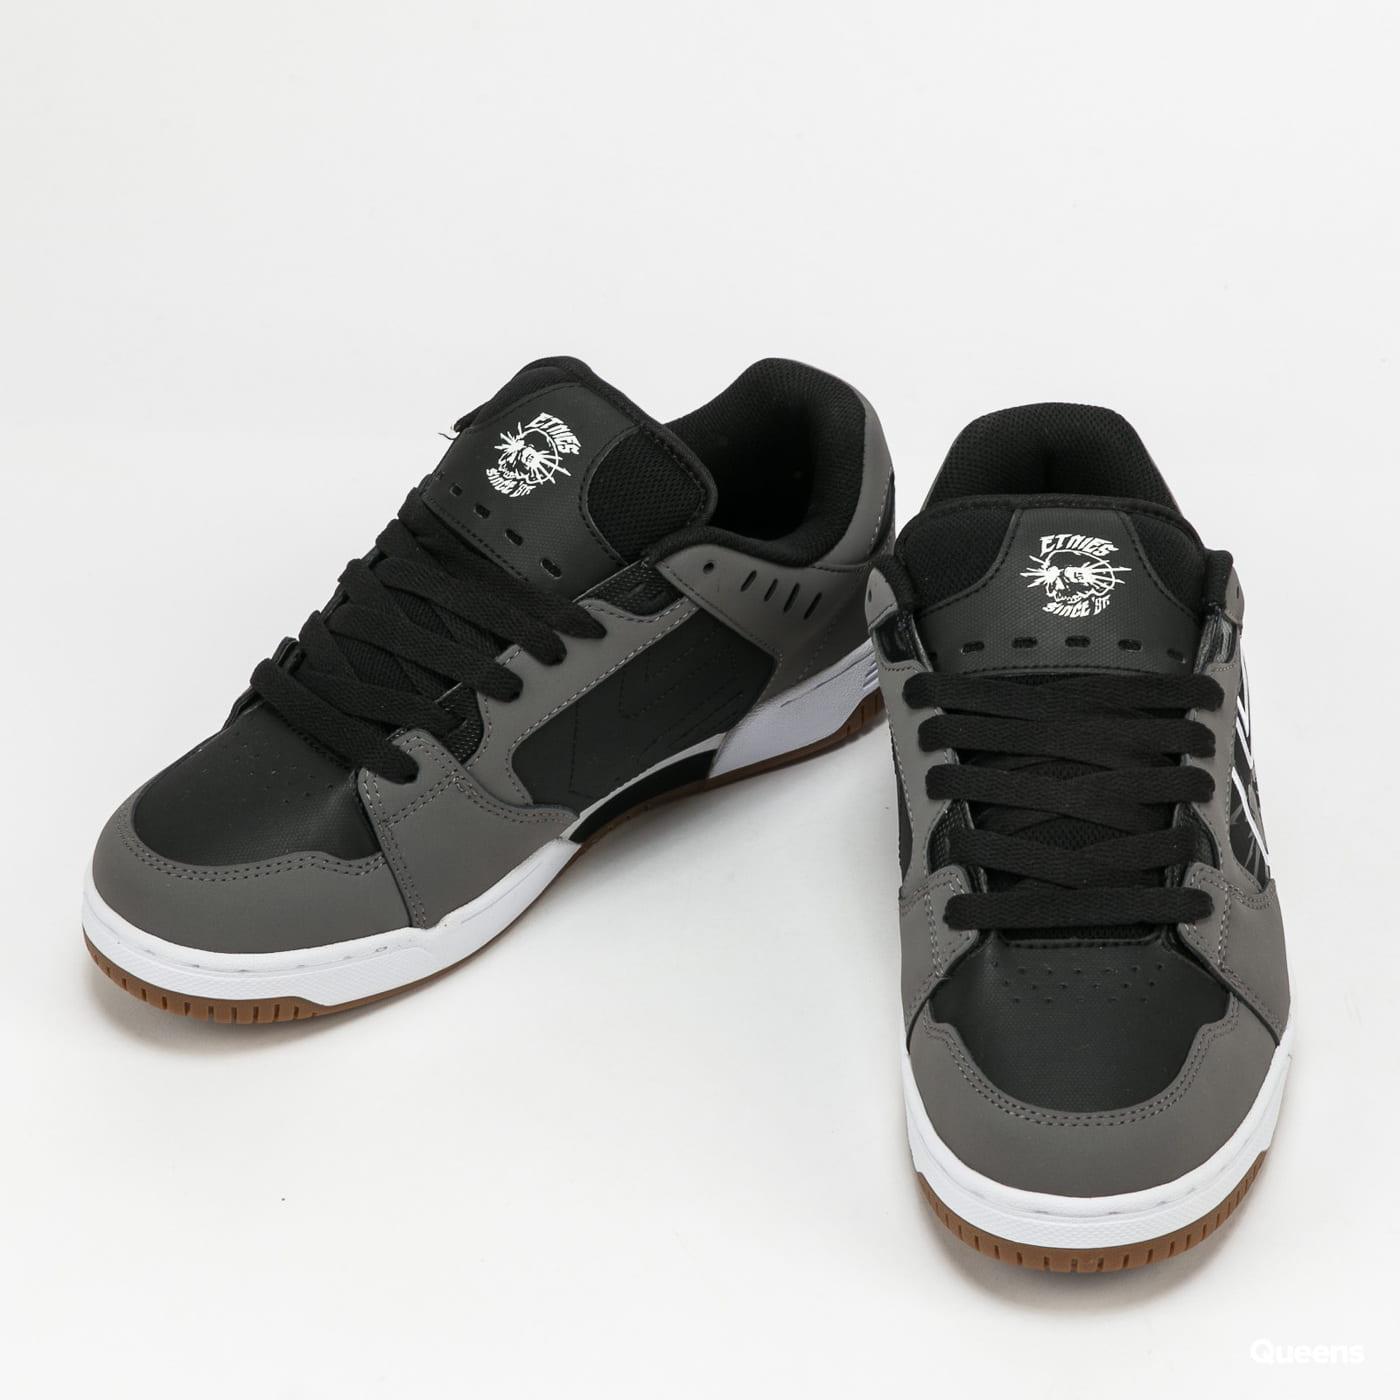 etnies Faze grey / black / white